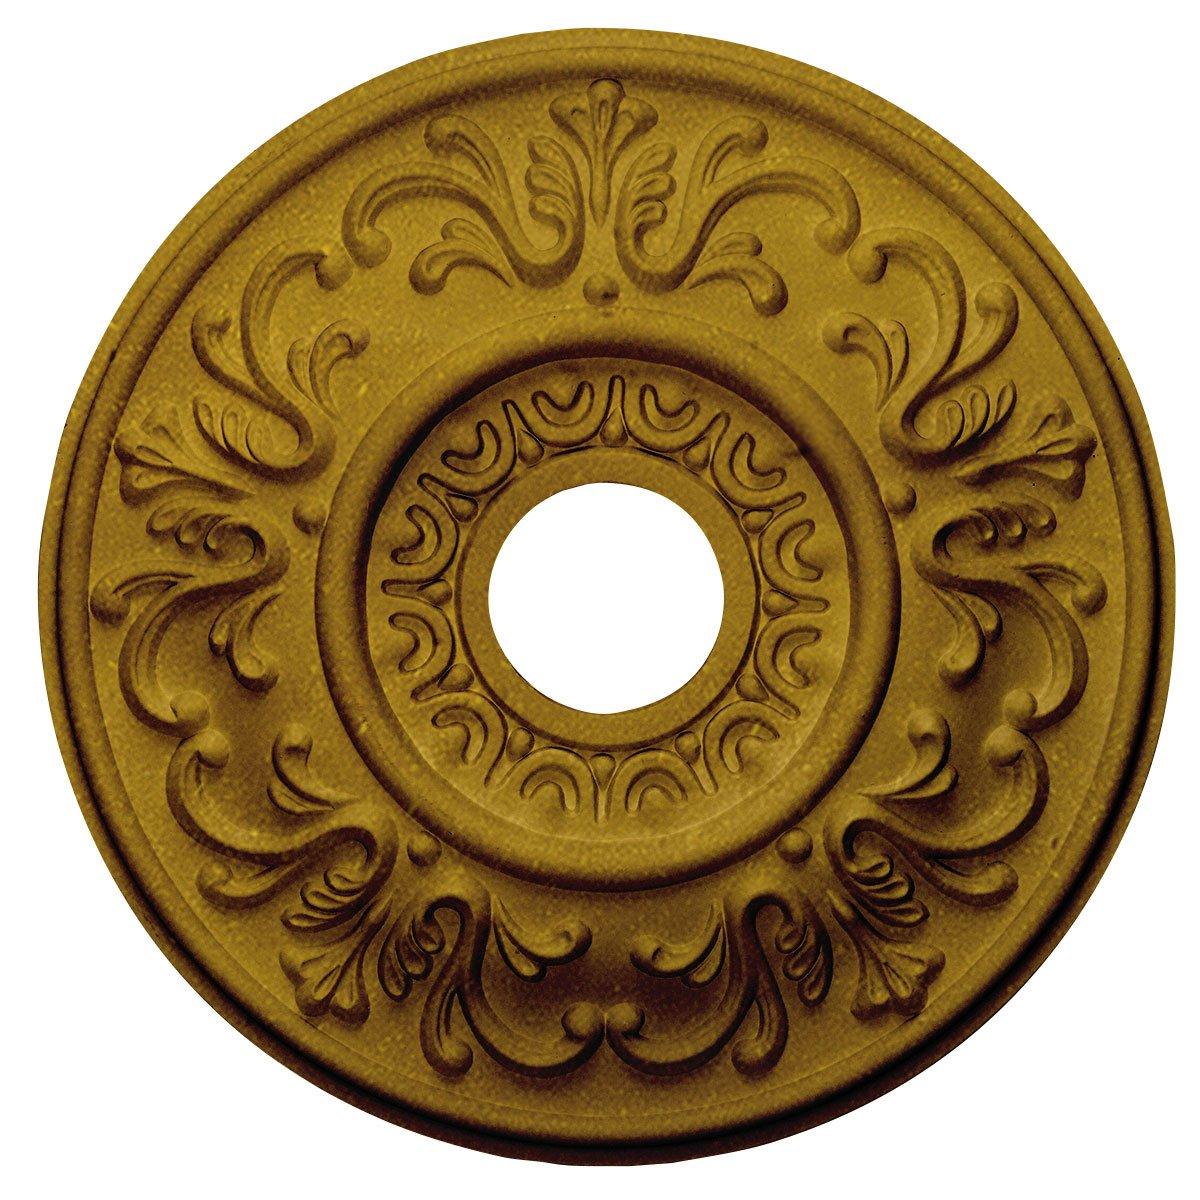 Ekena Millwork CM18VLPGS Valletta Ceiling Medallion fits Canopies up to 3 1/2'', Pharaohs Gold